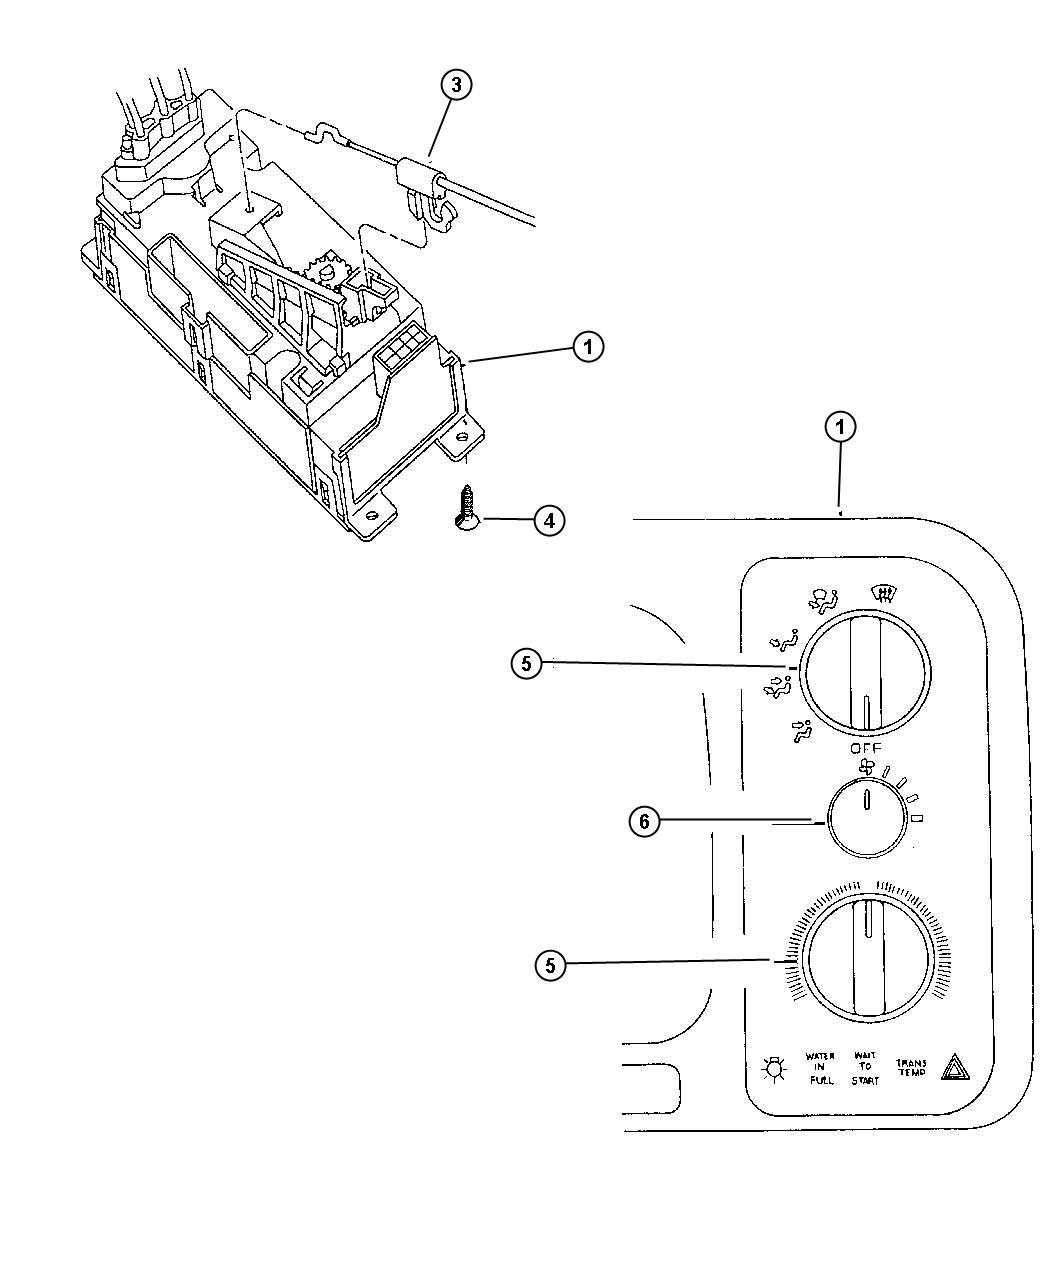 Diagram Dodge Ram Heater Wiring Diagram Full